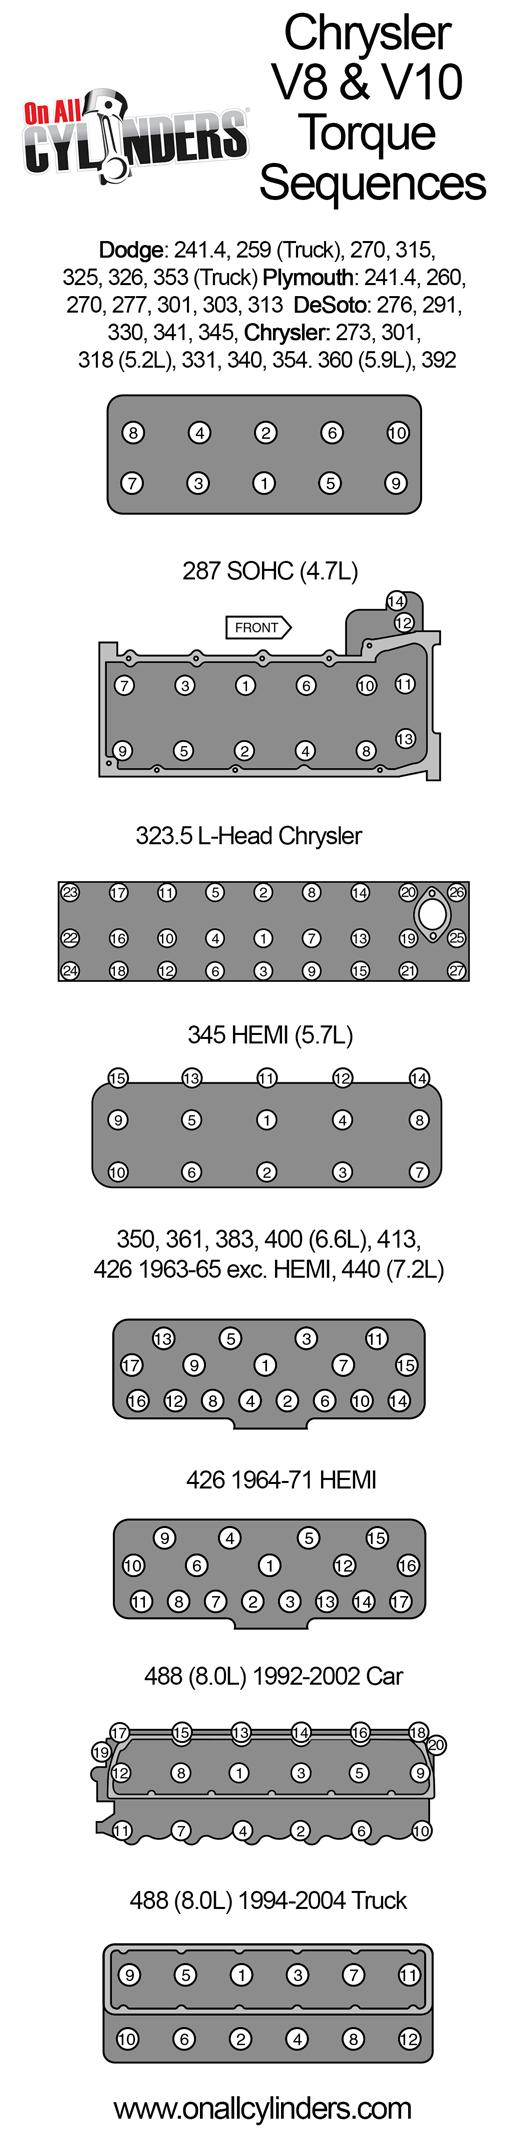 Chry-8-&-10-cyl-single-column